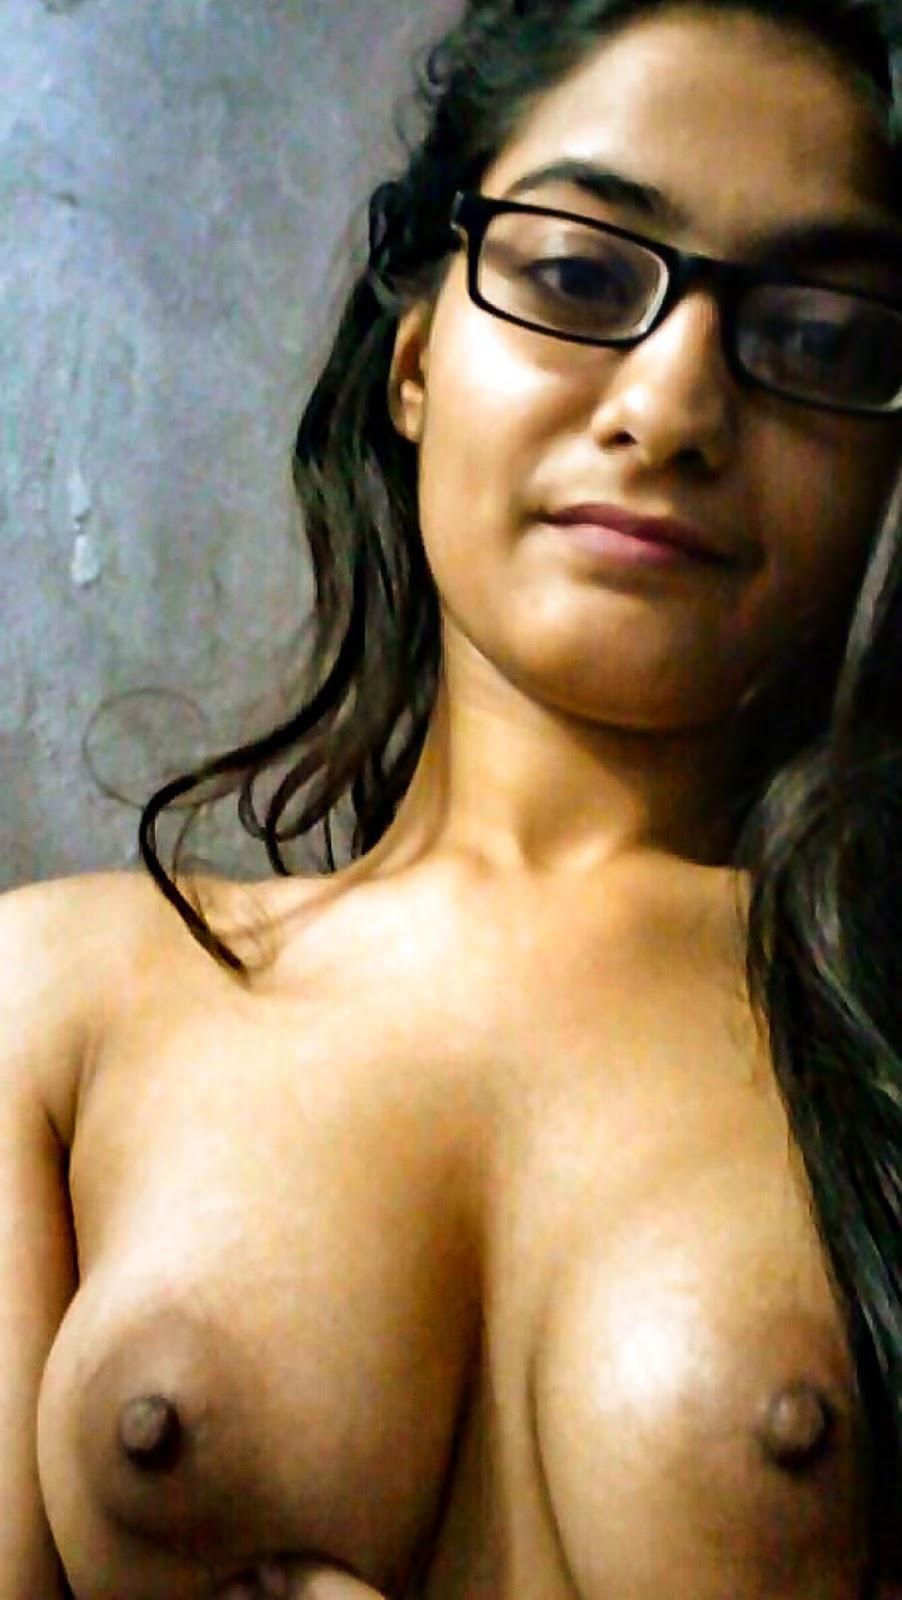 X Indian GirlsFree Desi Sex Images amp Videos